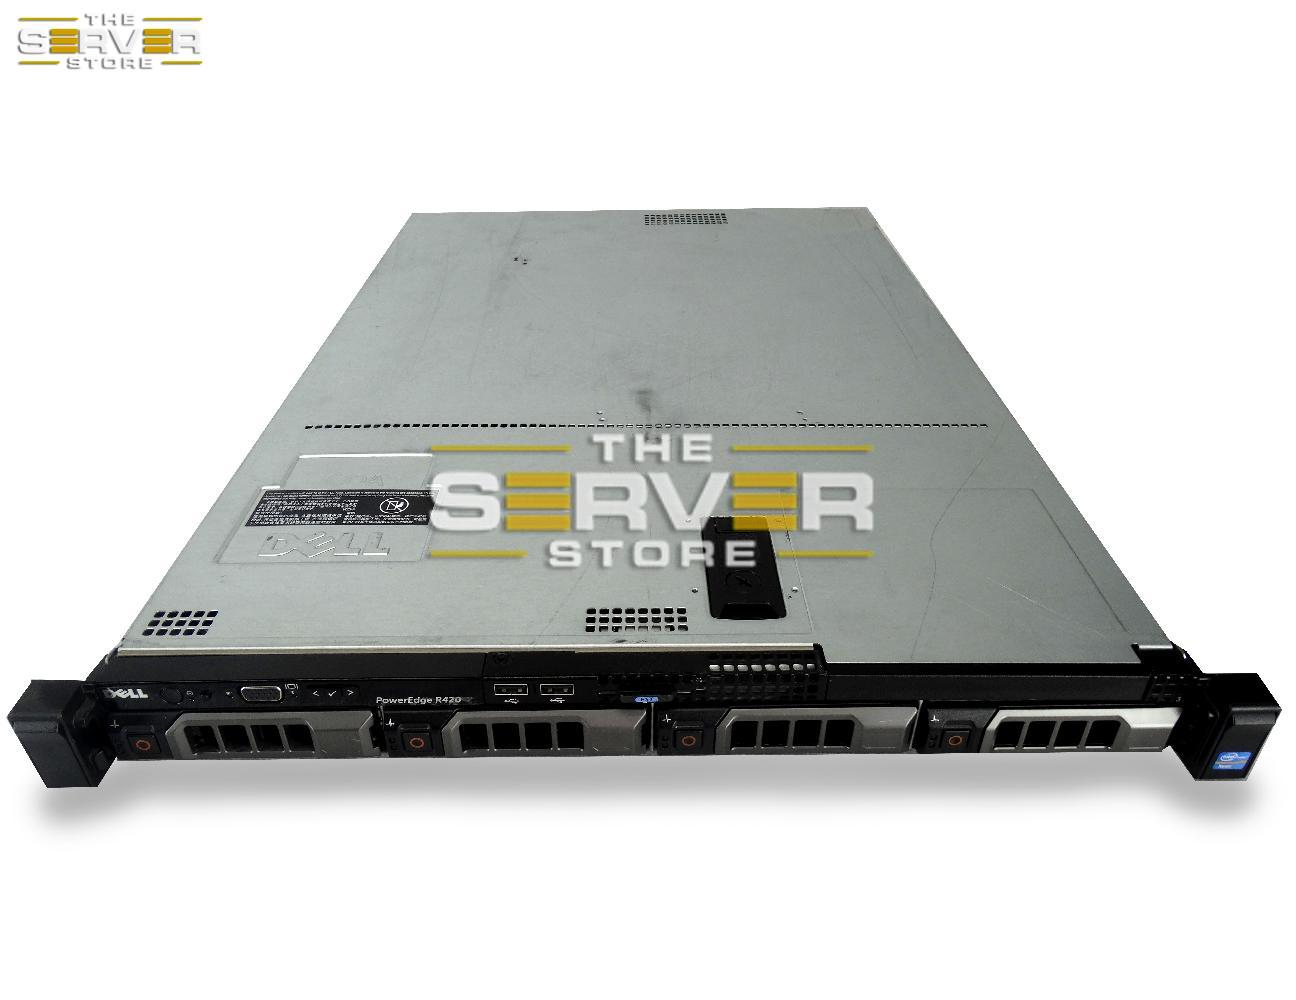 Dell PowerEdge R420 4x 1U LFF Server